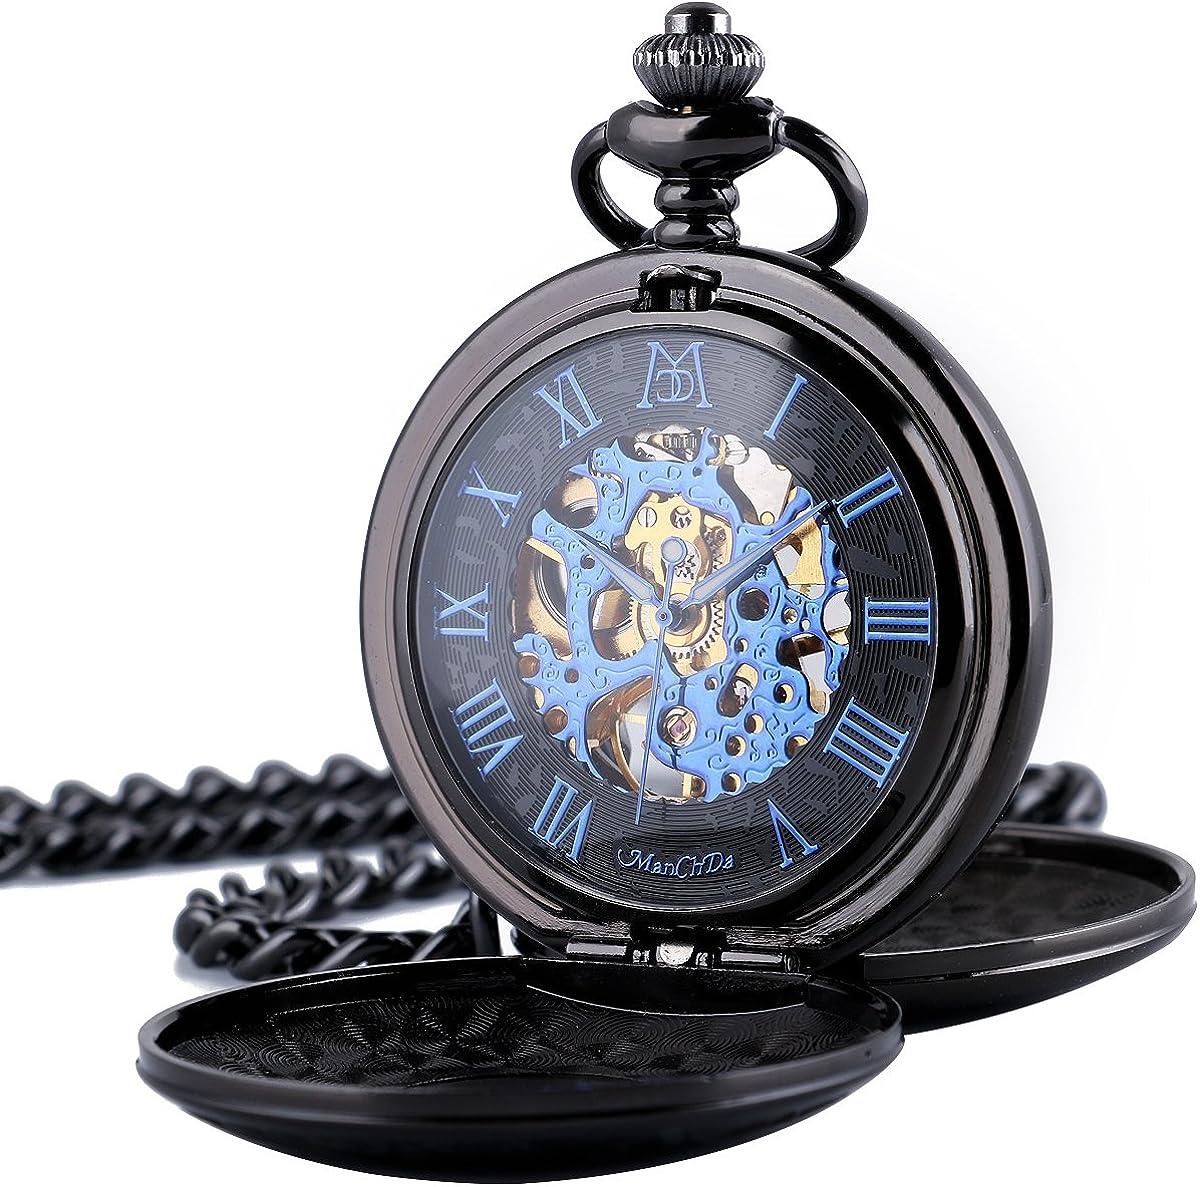 Reloj de Bolsillo – Doble Grabado con Esfera Esqueleto ManChDa Retro para Hombre, Movimiento Dorado con Cadena + Caja de Regalo